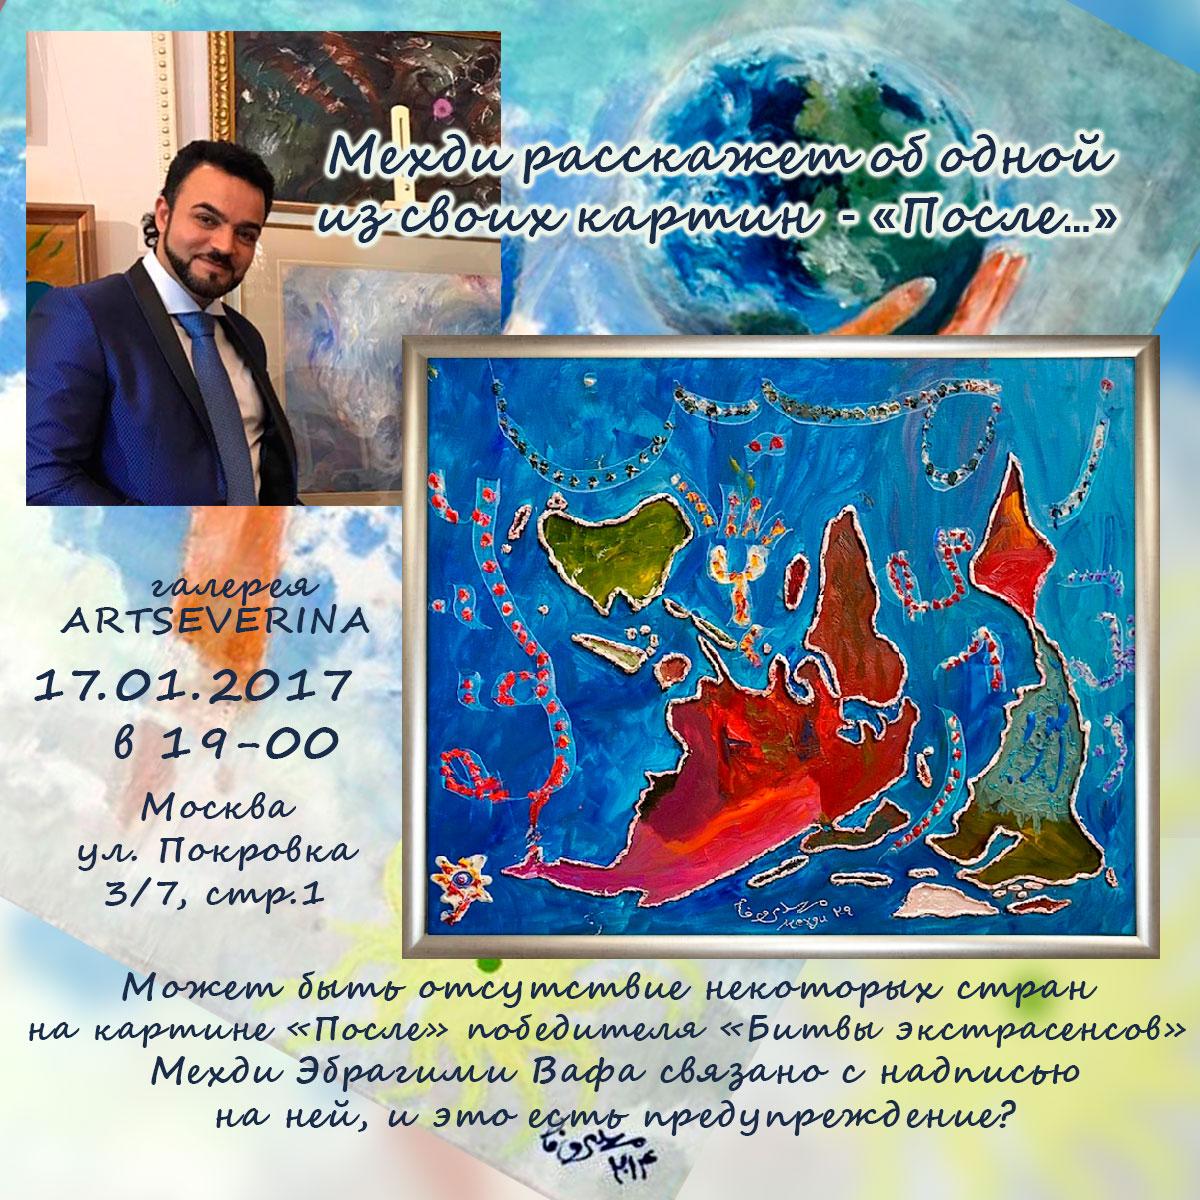 Mehdi-kartina-POSLE-artseverina-17-01-2017